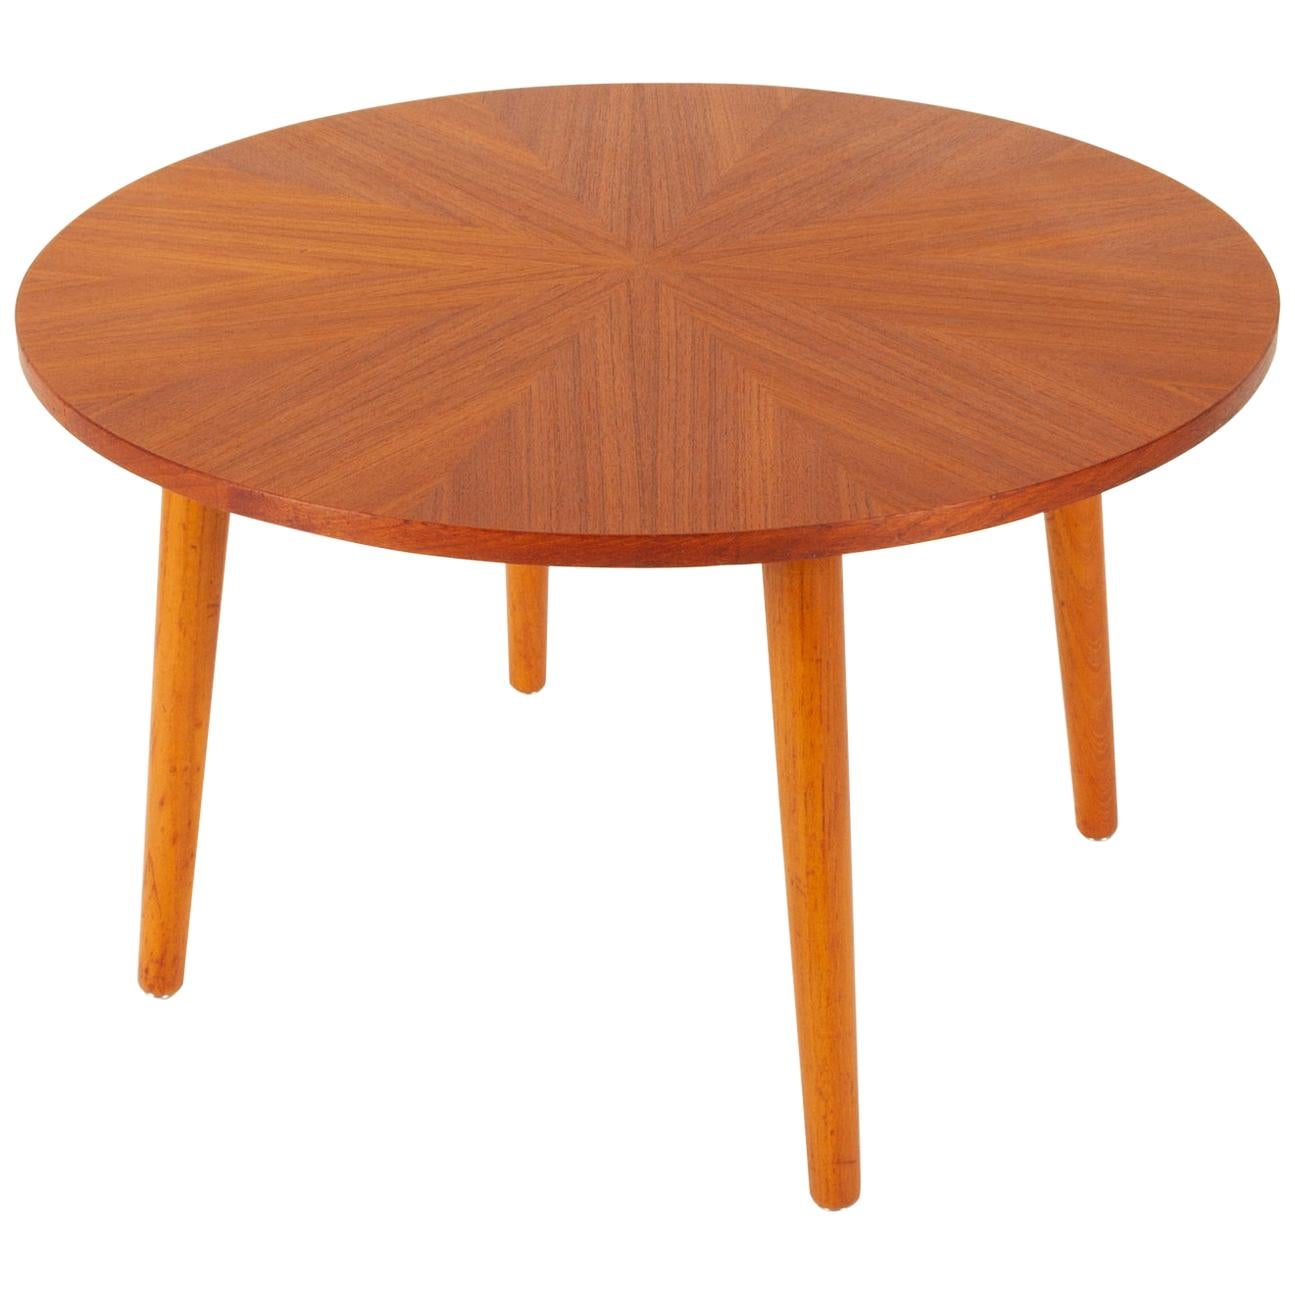 Danish Round Teak Coffee Table by Holger Georg Jensen, 1960s